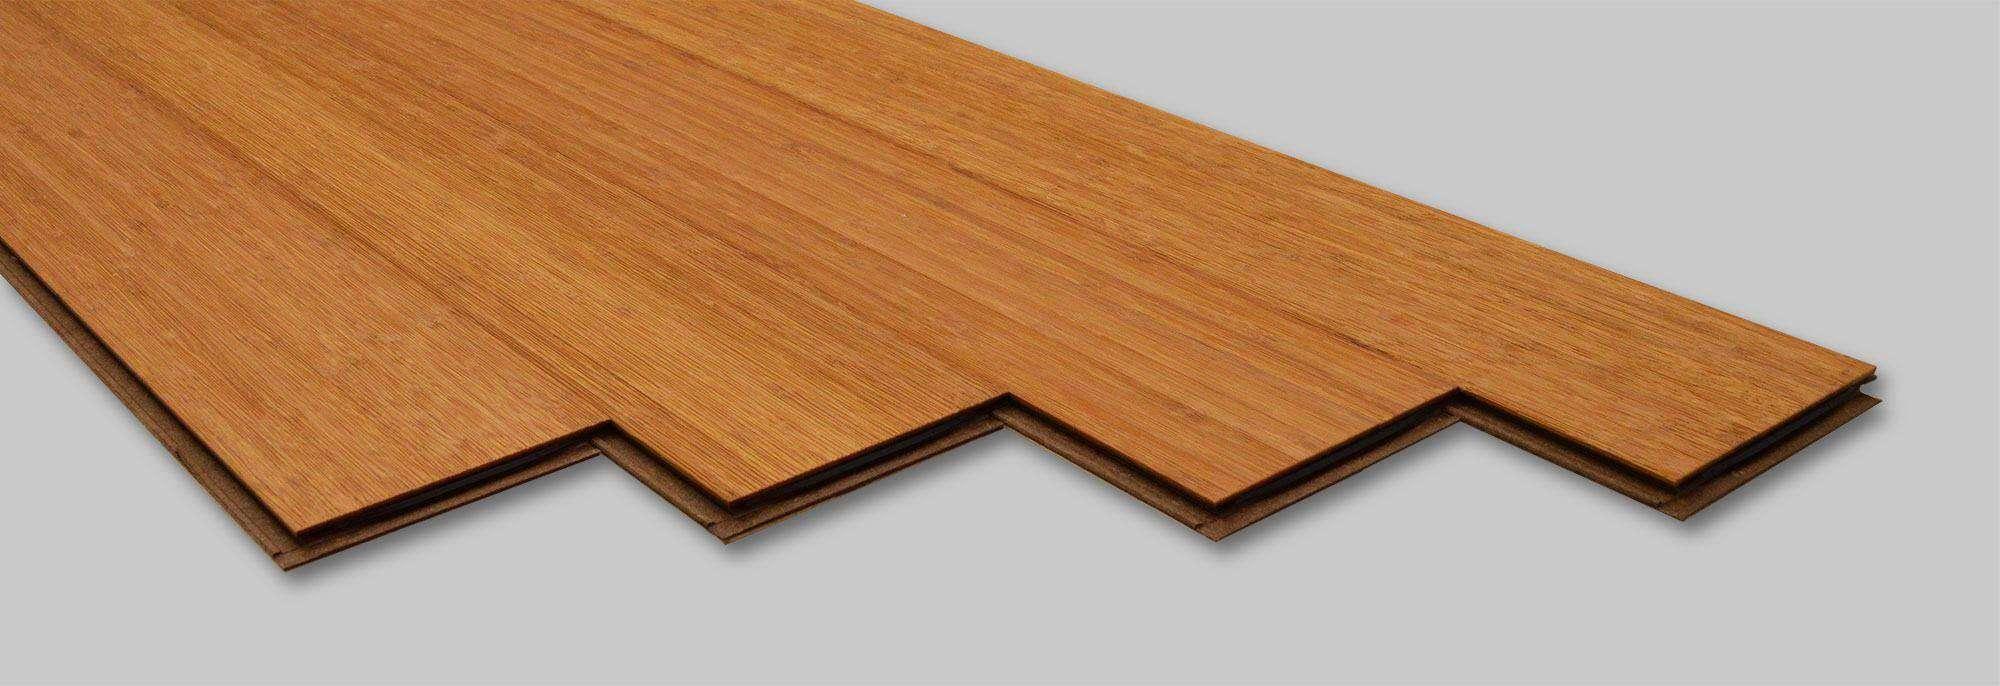 'bambuko grindys'or 'vidaus grindys' or 'parketlentės' or 'plaukiojančios grindys' or 'medinės grindys' or 'geros grindys'